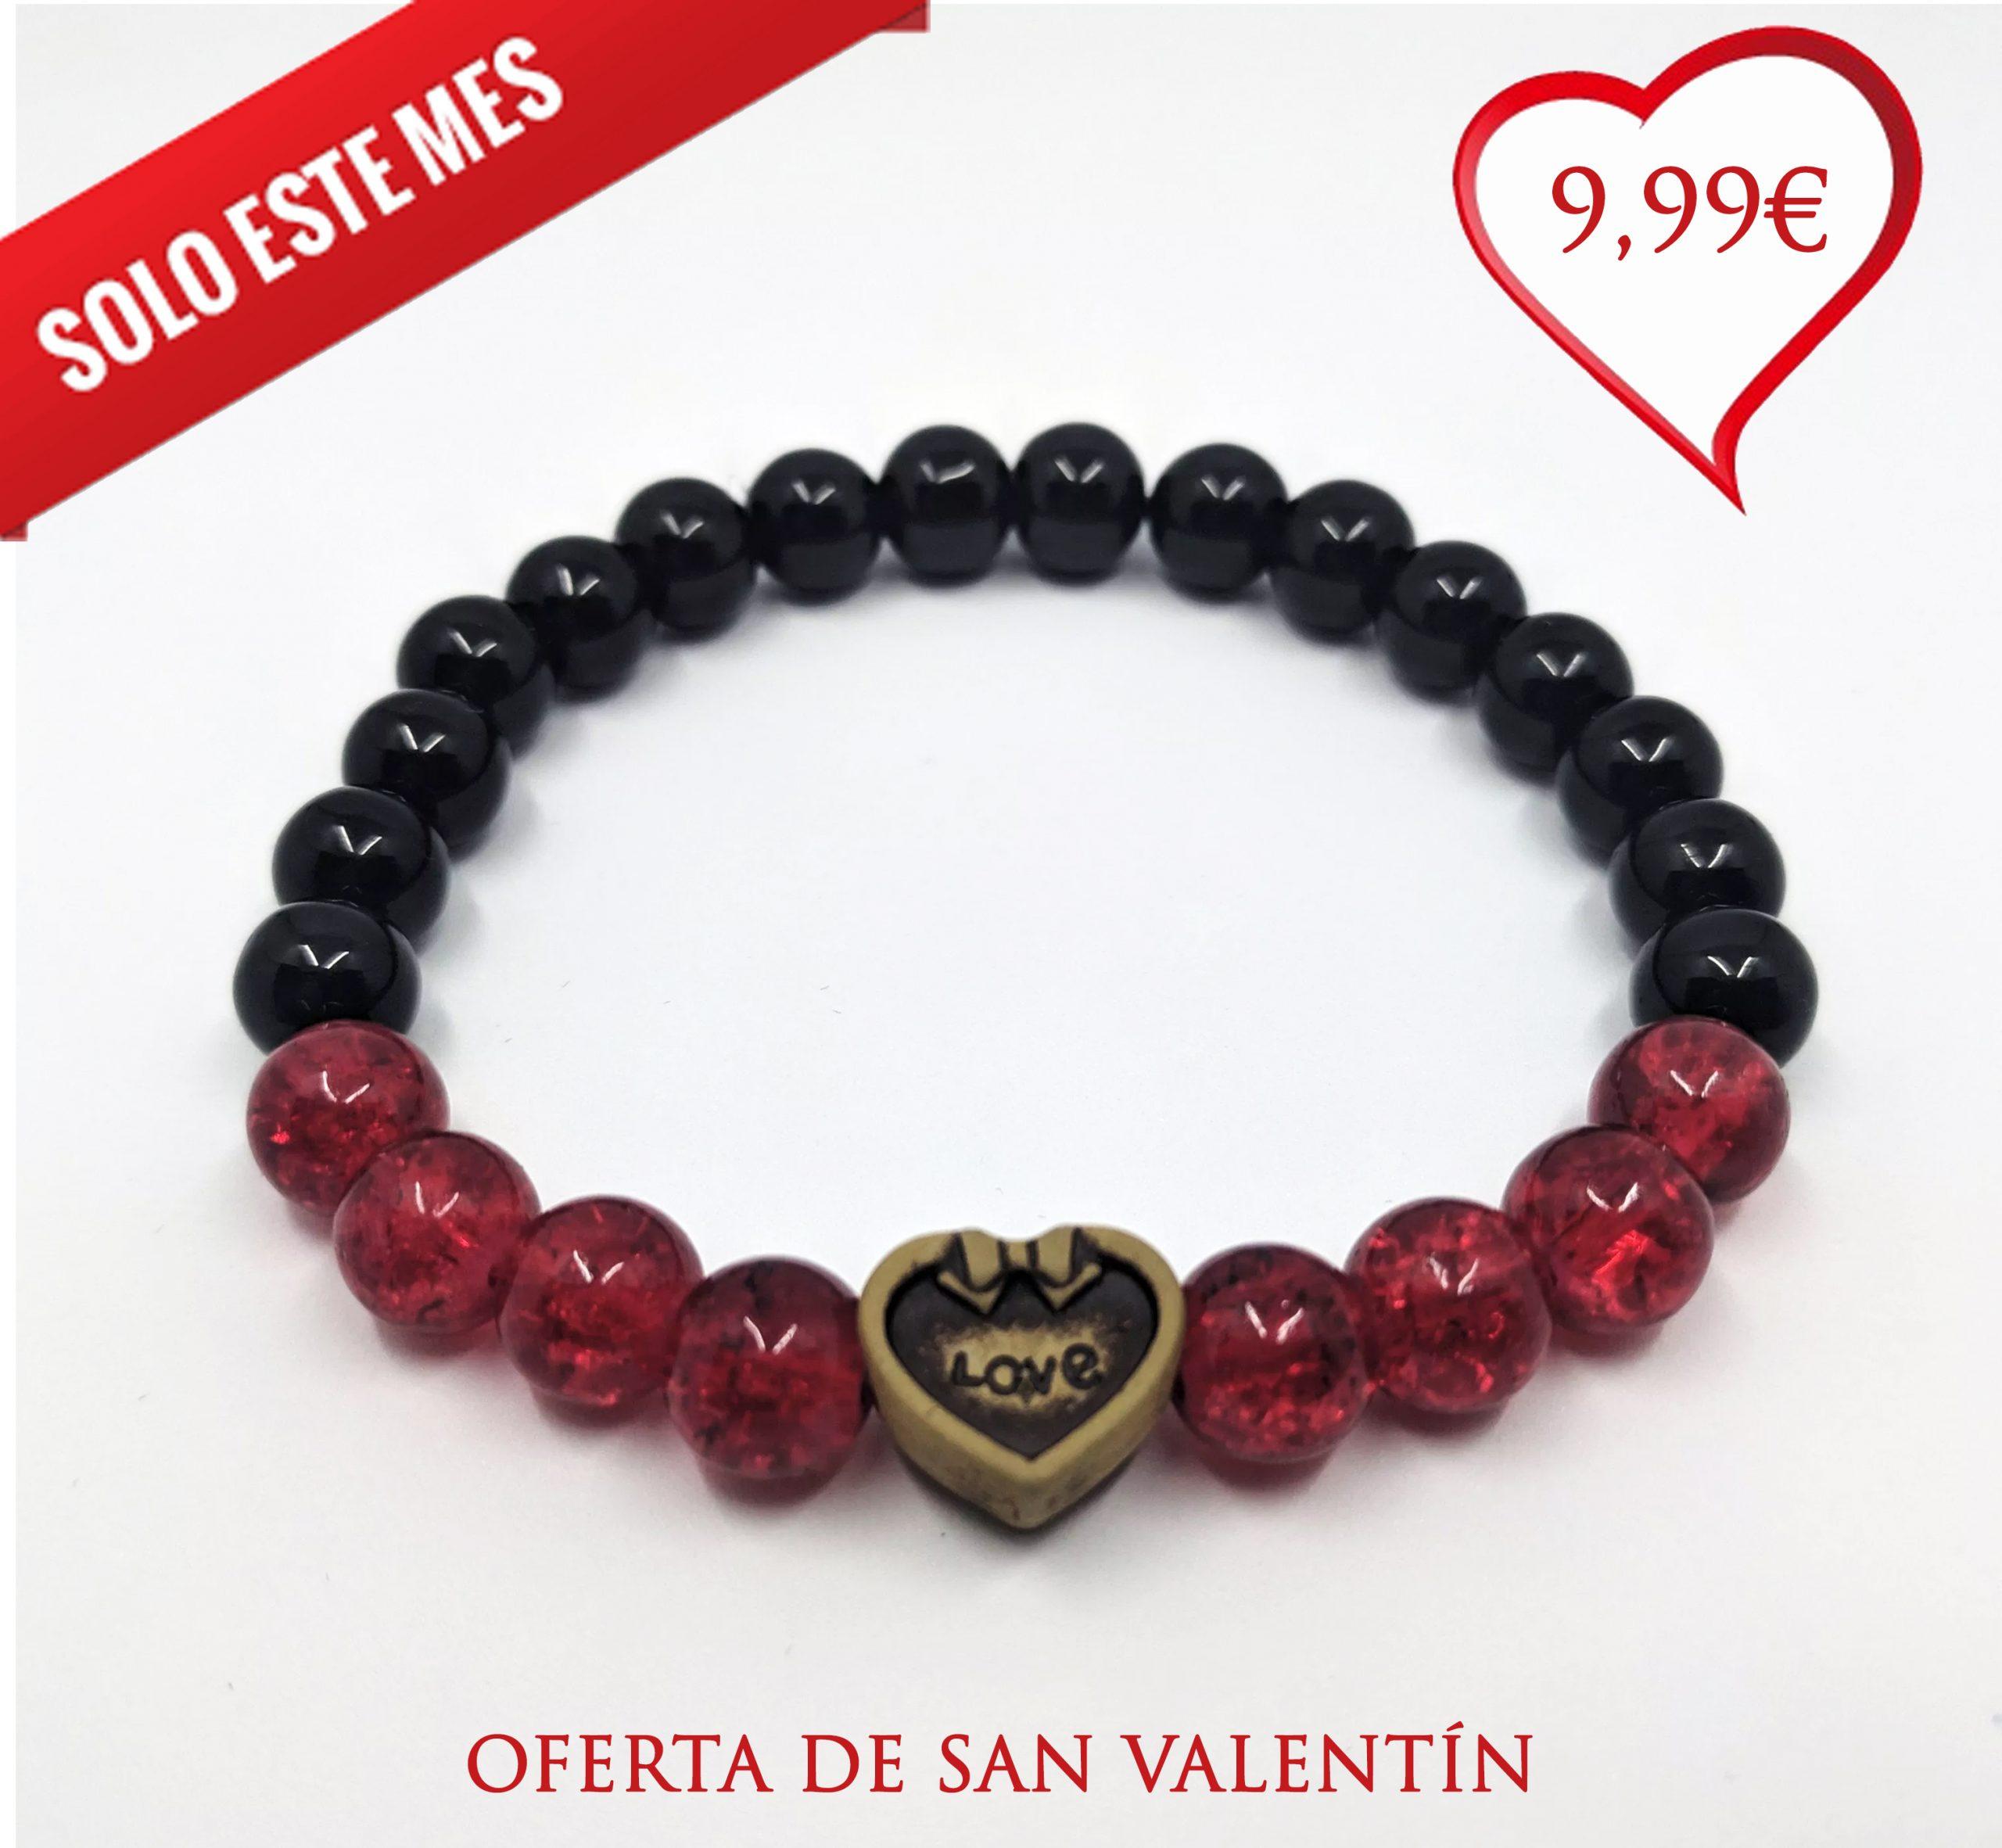 ¡Haz tu regalo de San Valentín por 9,99€!